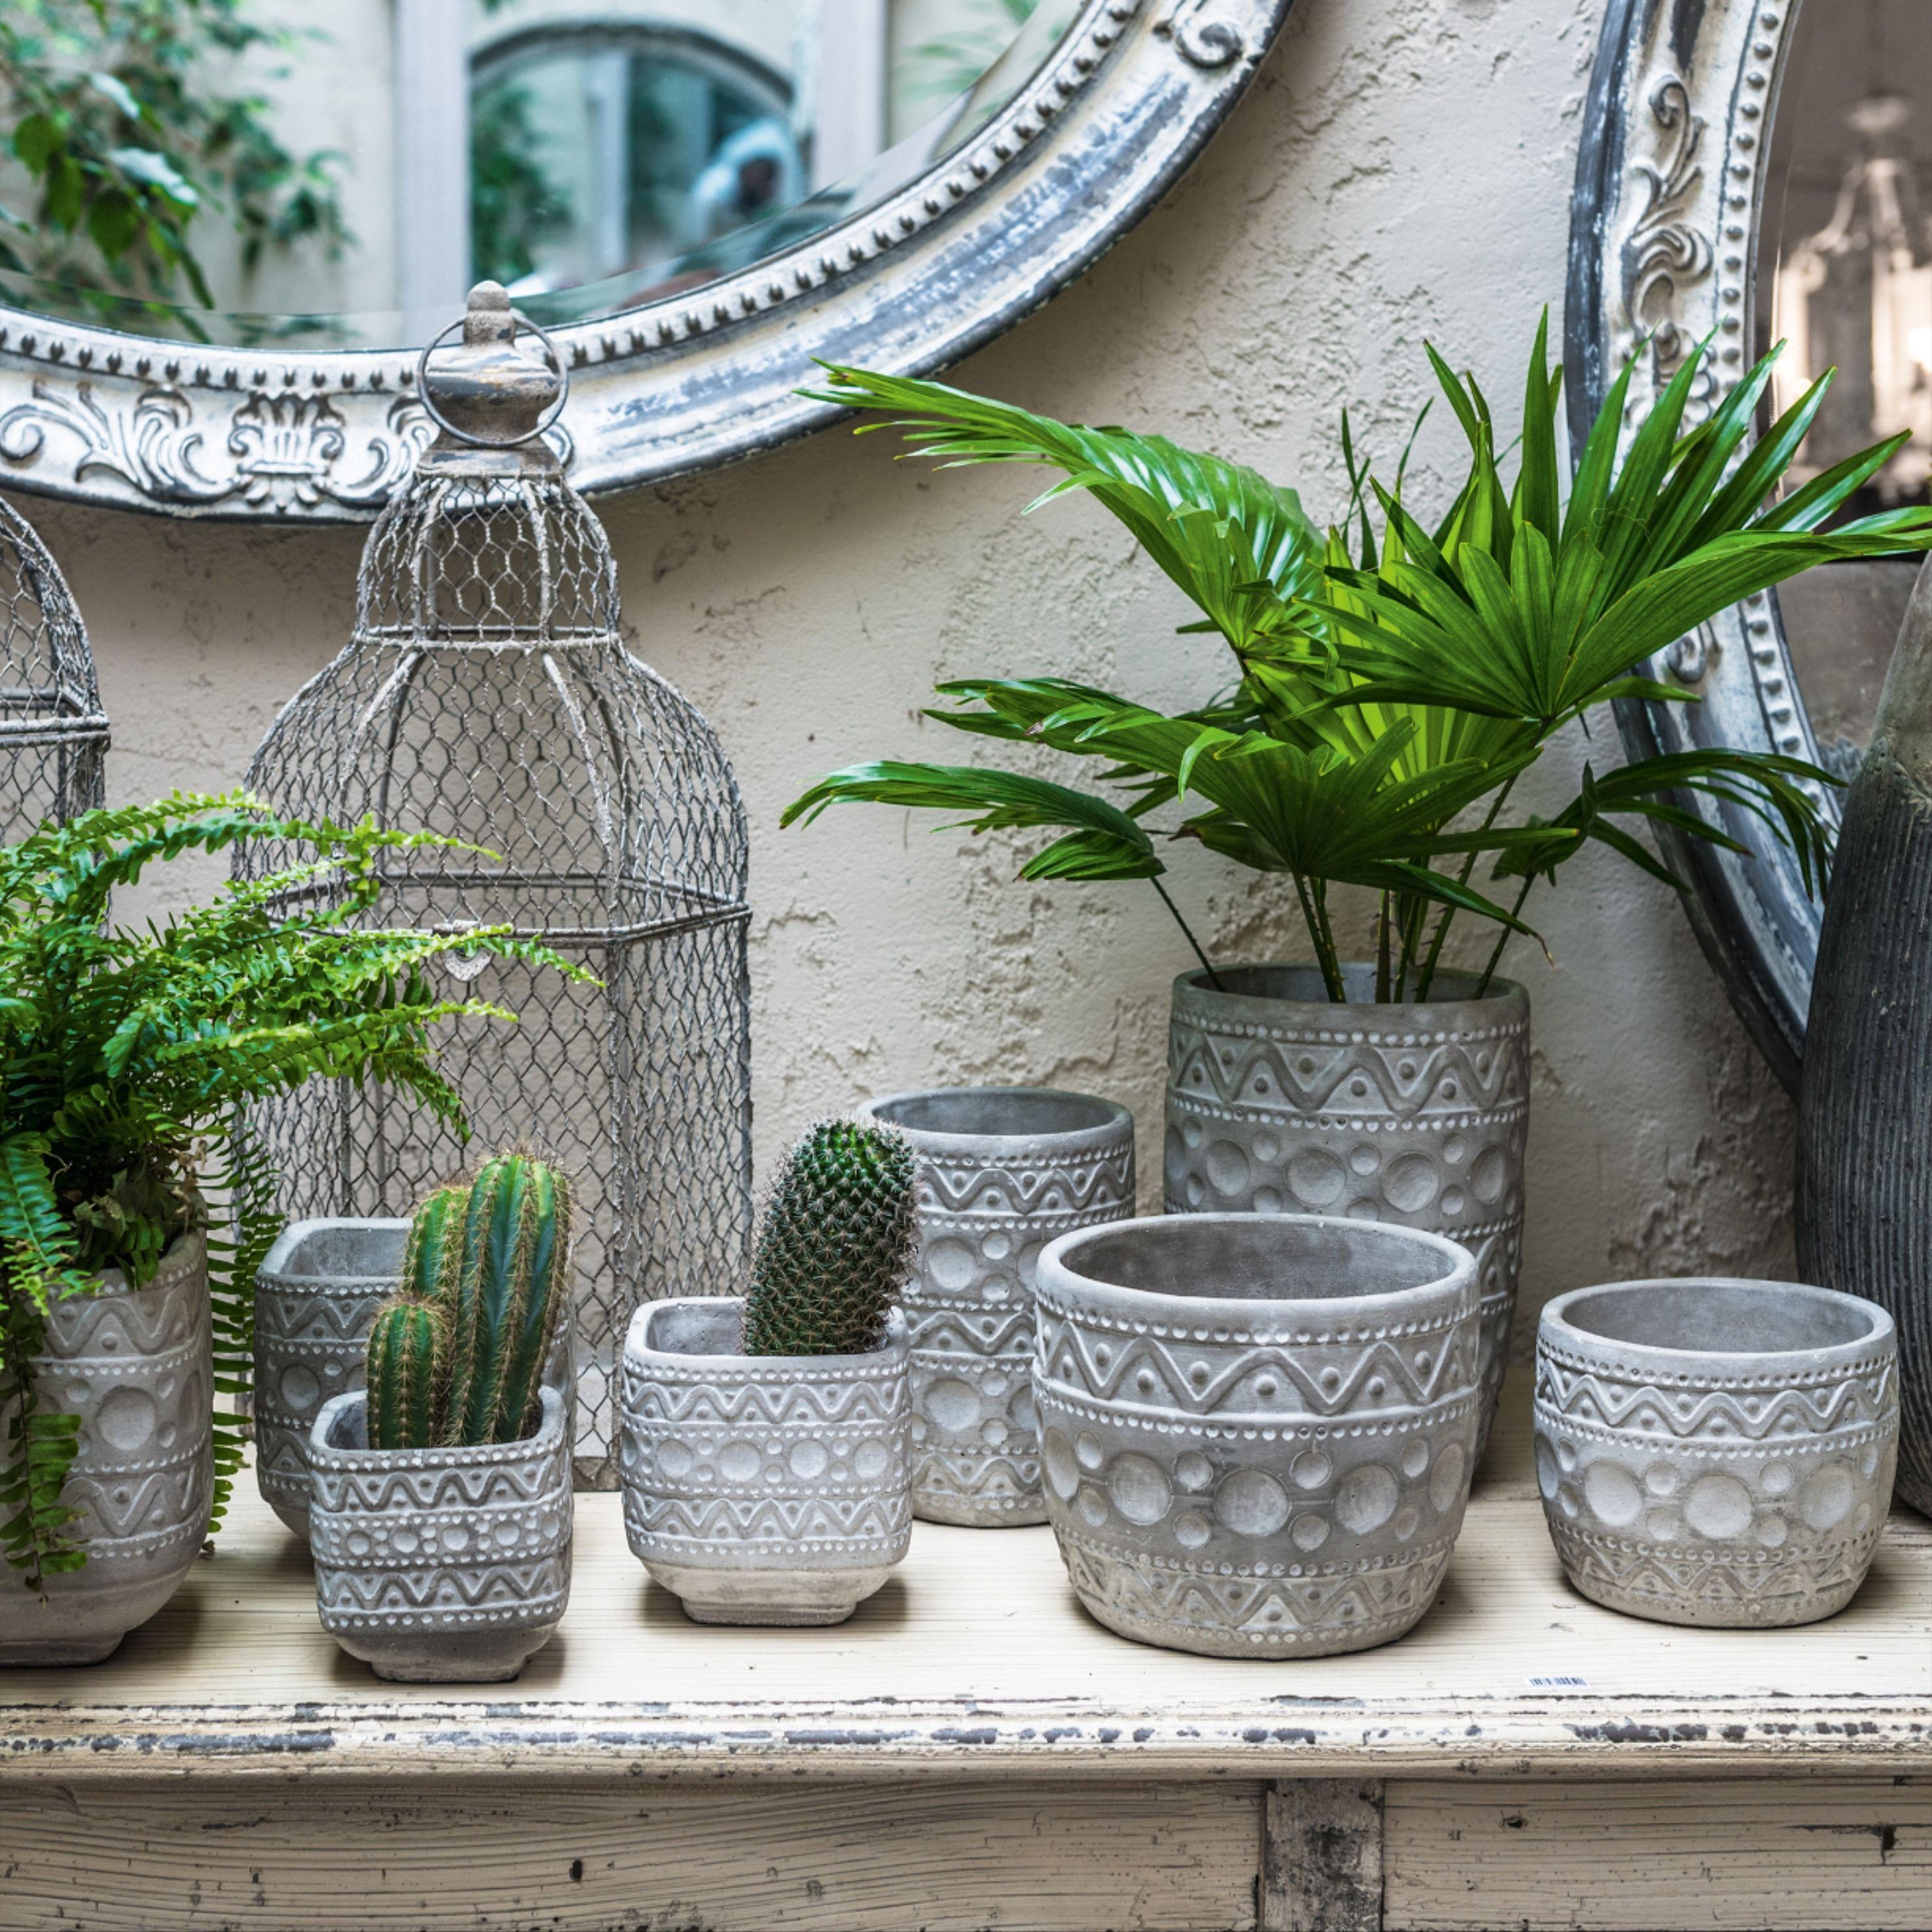 Oslonki Kwadratowe Grigio Belldeco Glass Vase Planter Pots Home Decor